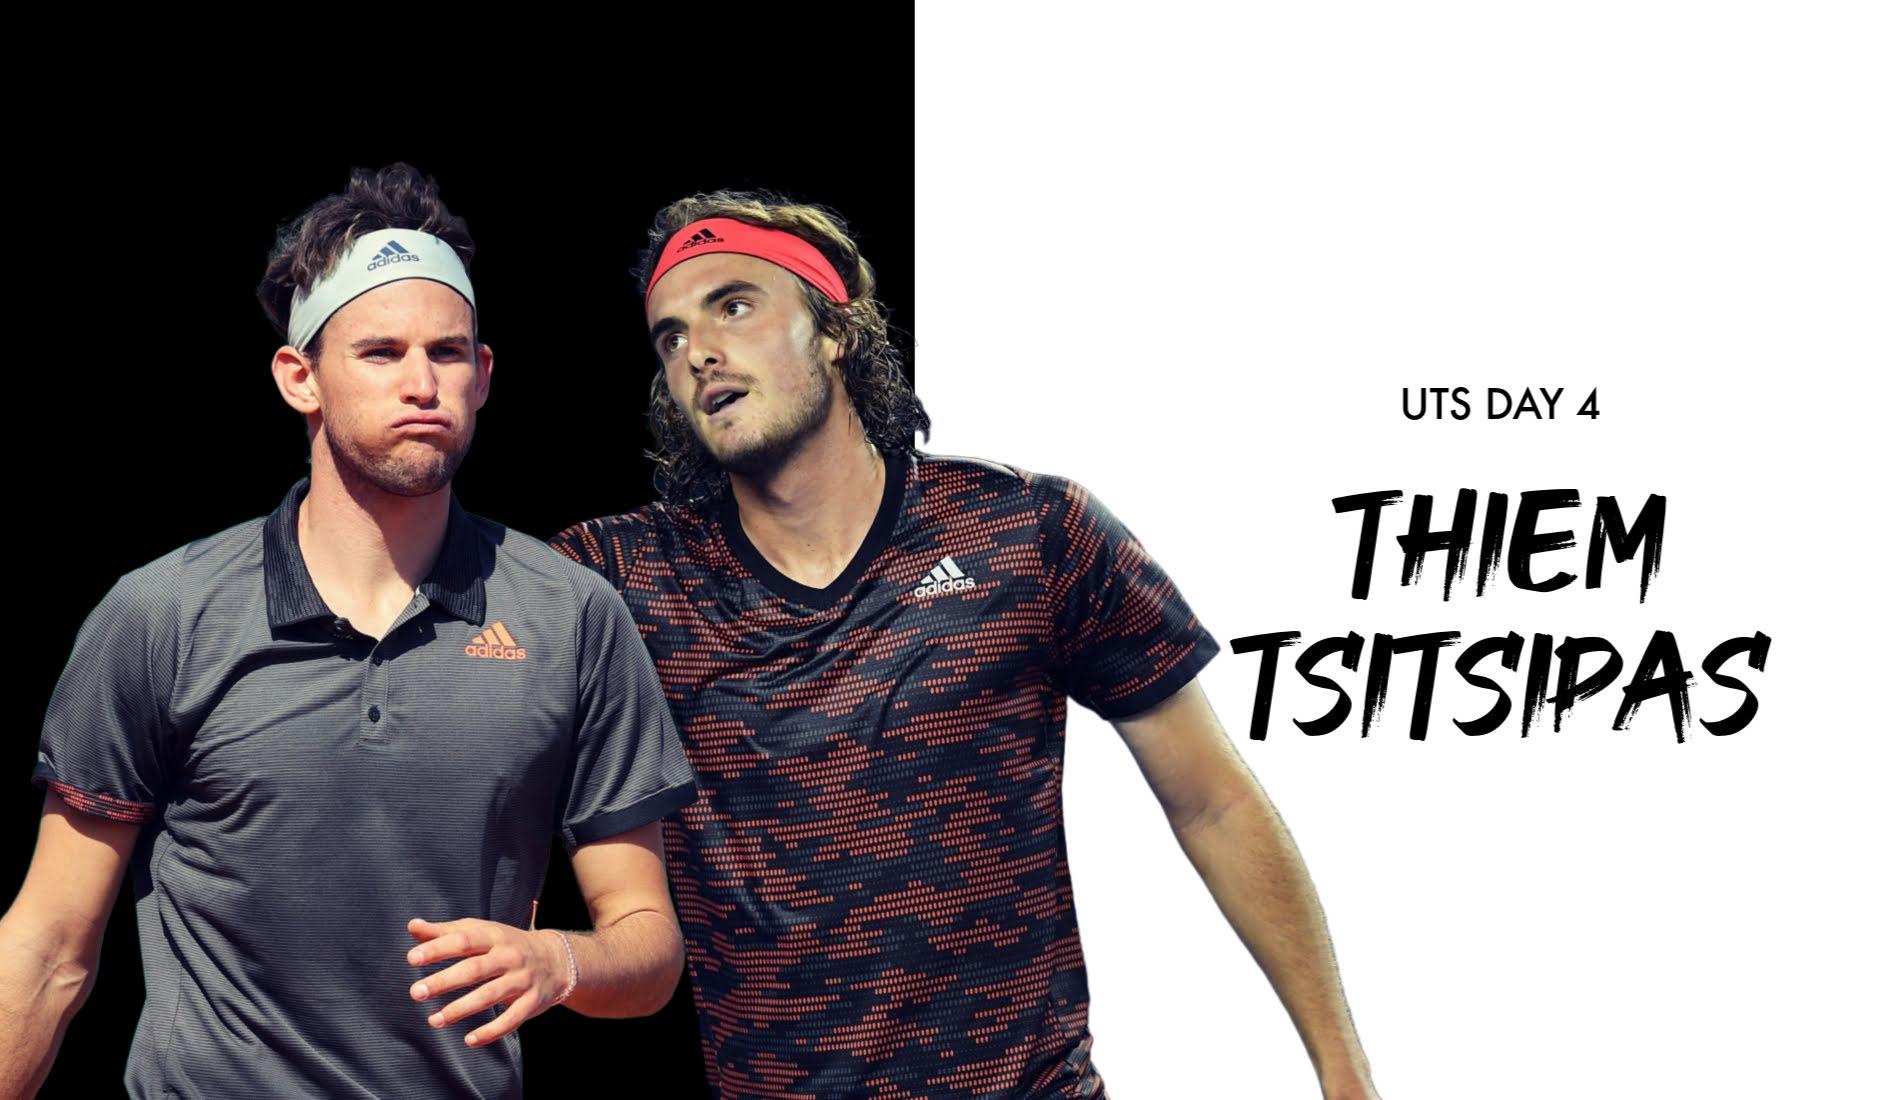 UTS1 - Day 4: Dominic Thiem vs Stefanos Tsitsipas